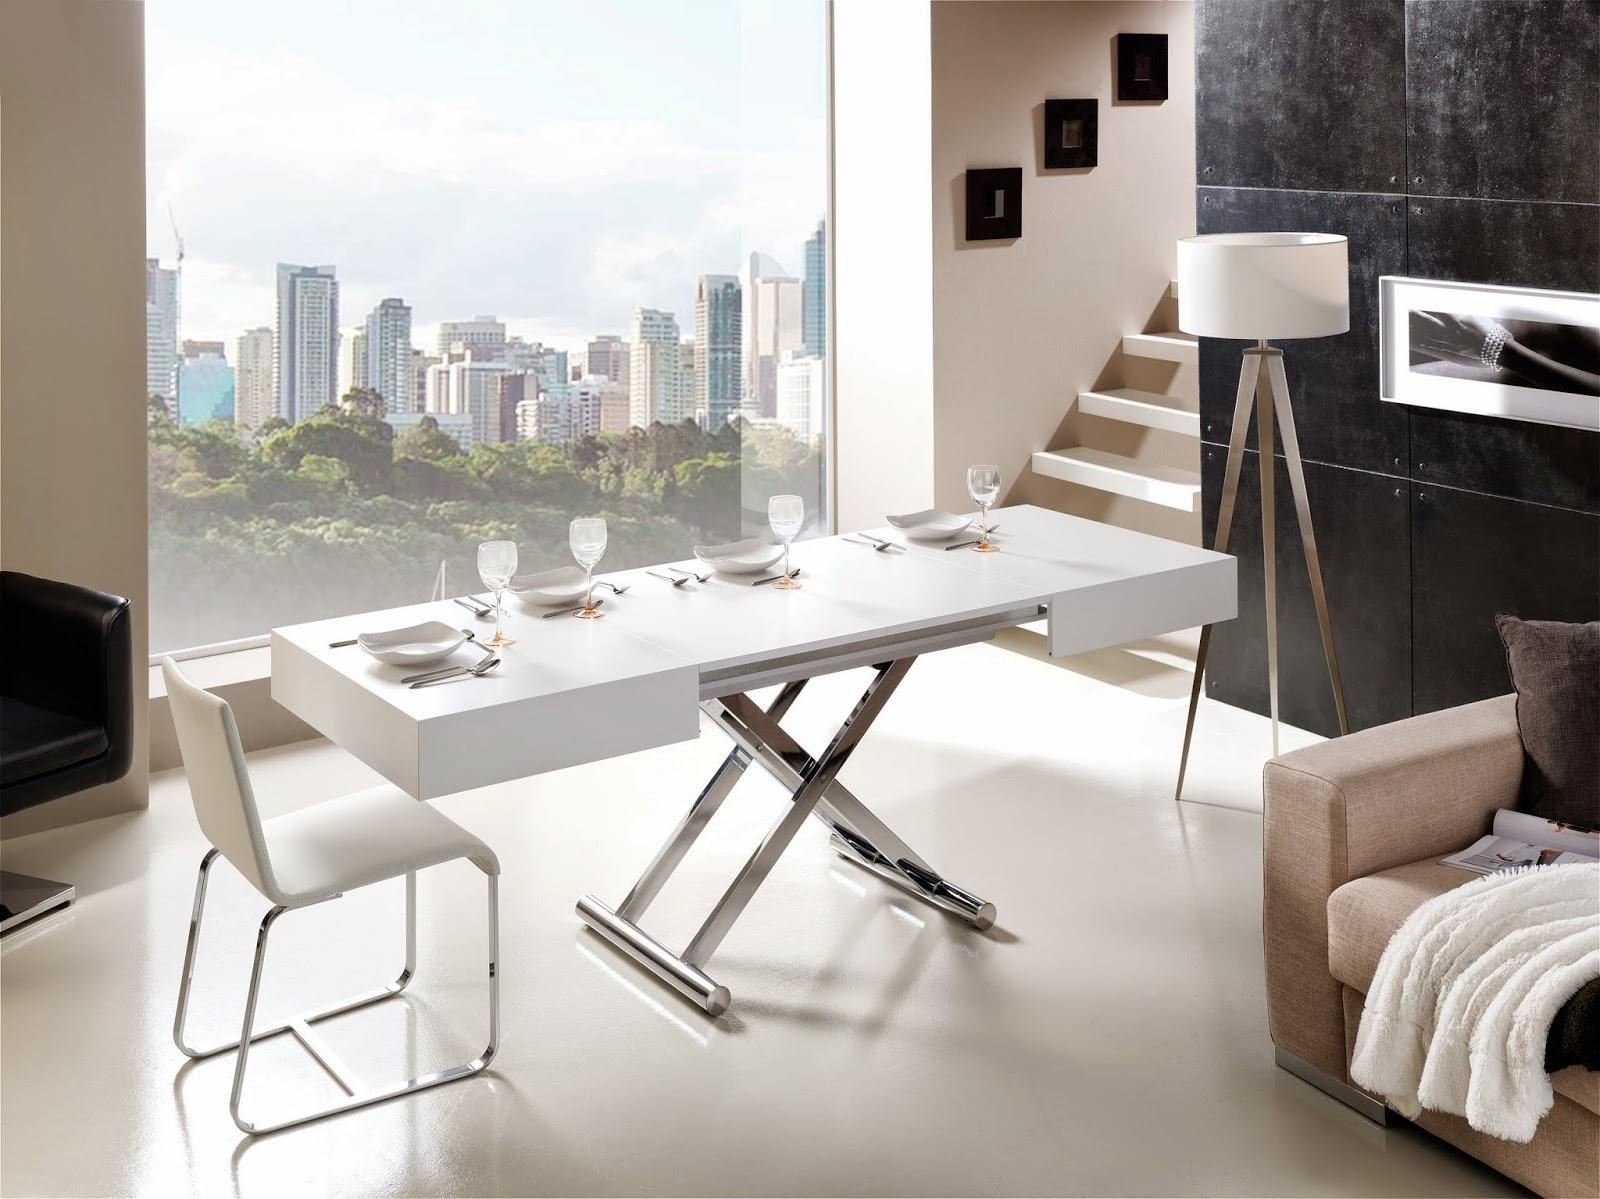 muebles diseo madrid muebles modernos de salon salones diseo madrid